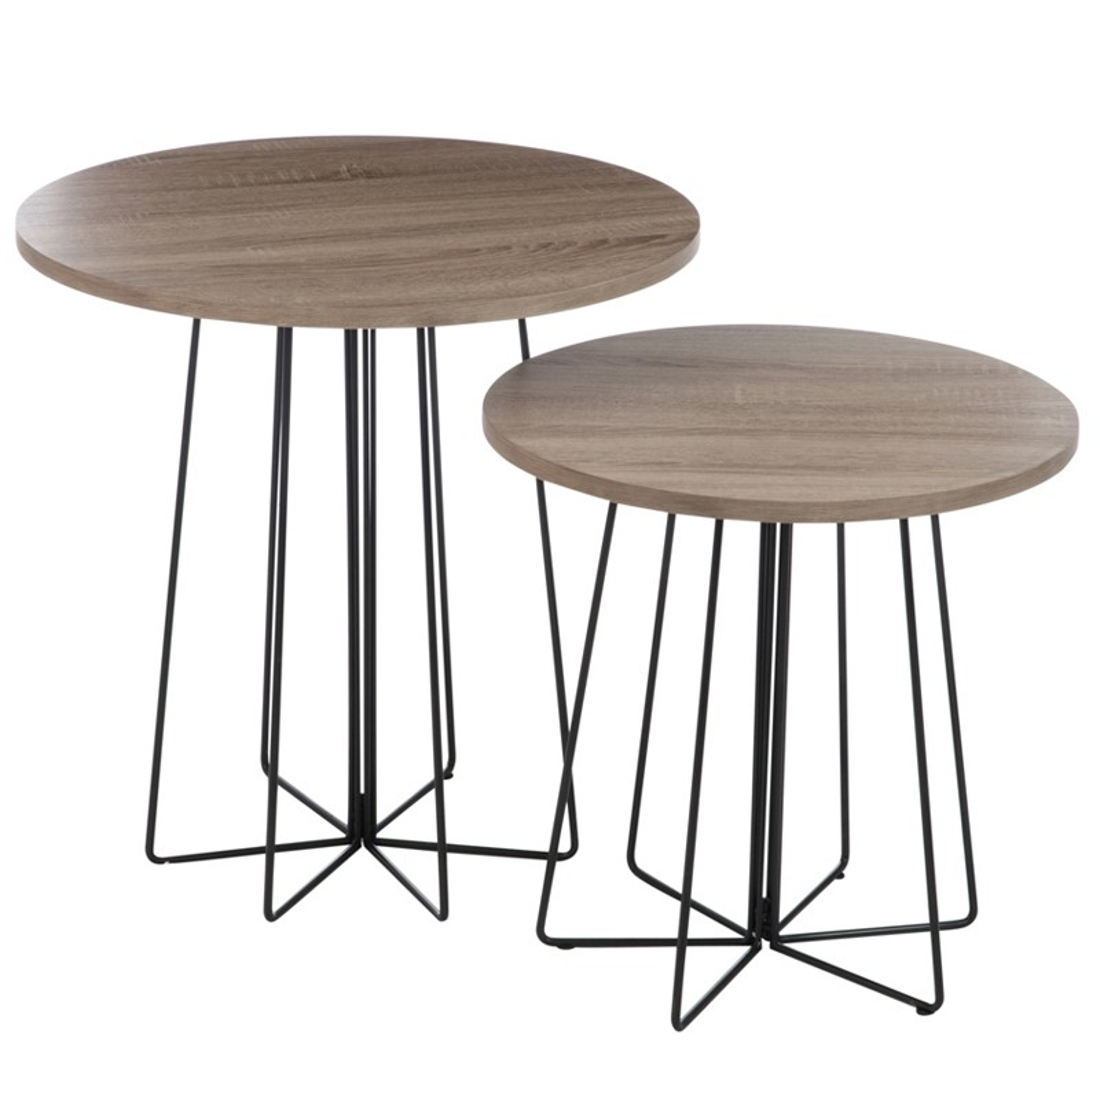 table gigognes rondes pied central fidji univers des petits meubles. Black Bedroom Furniture Sets. Home Design Ideas